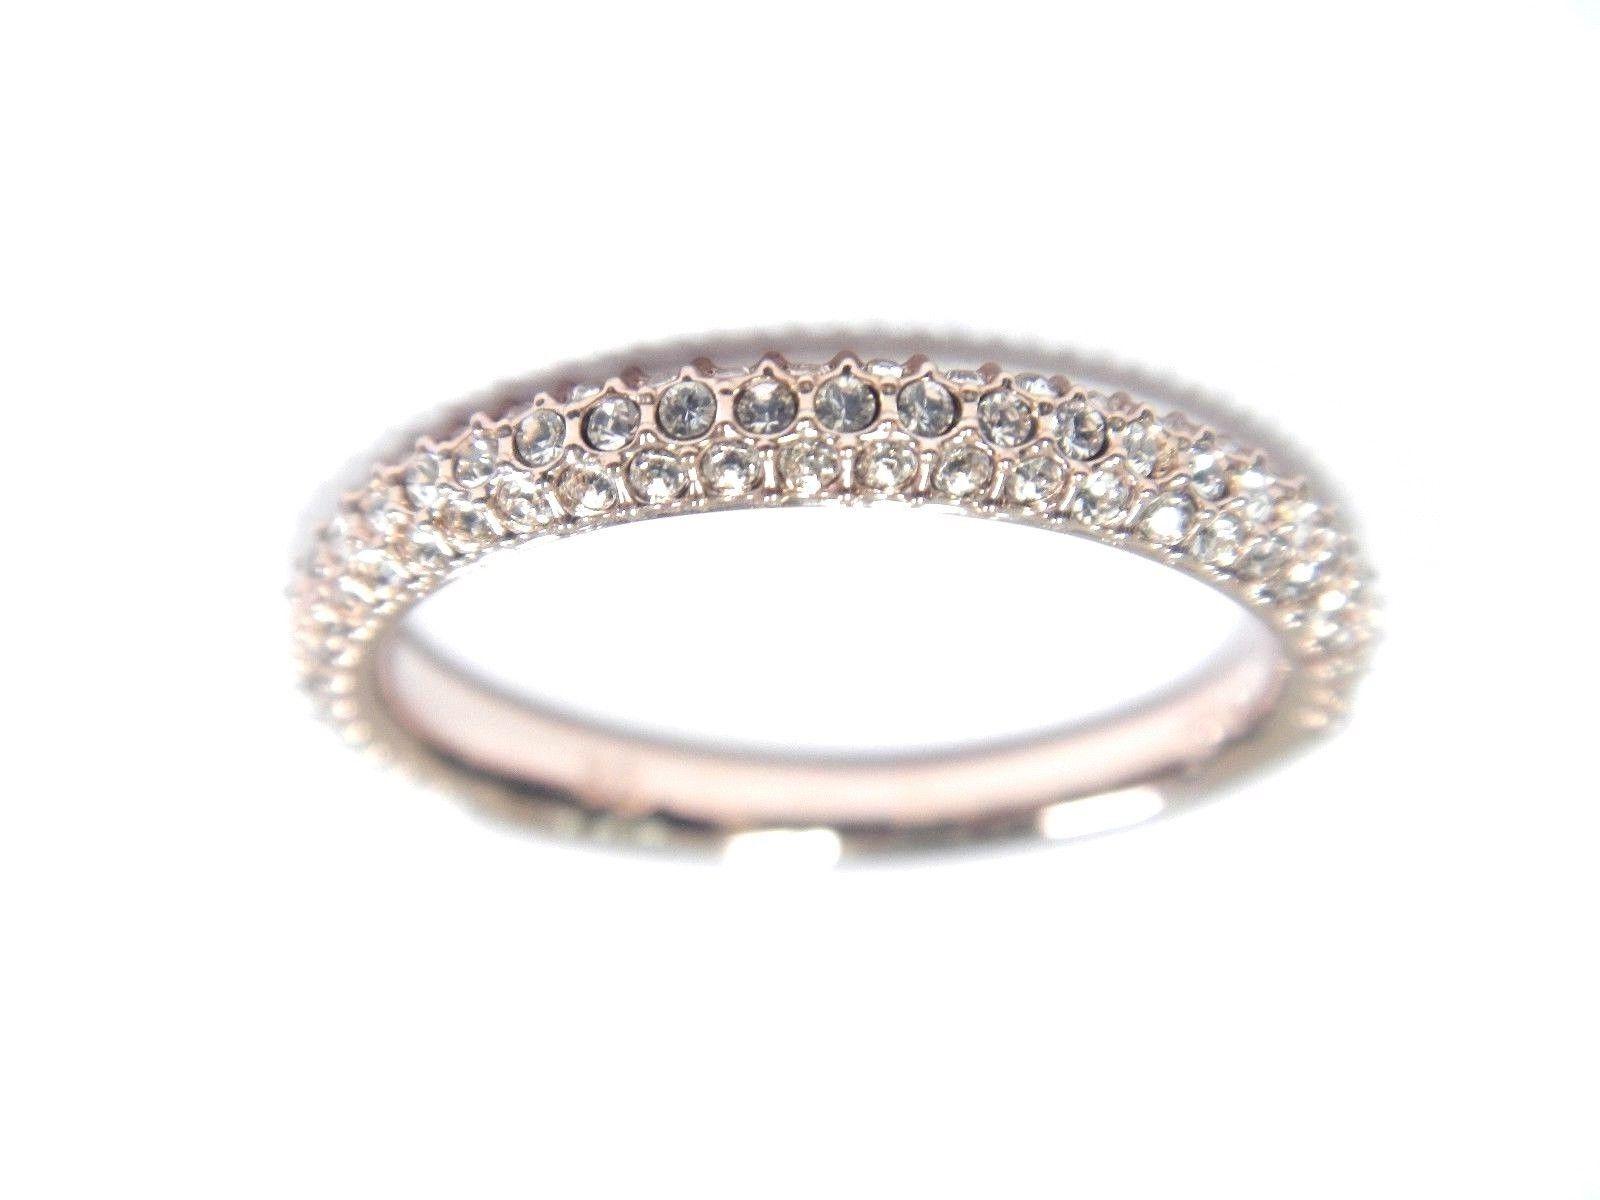 STONE MINI RING PINK pink gold SIZE 6 SWAROVSKI JEWELRY 5402443